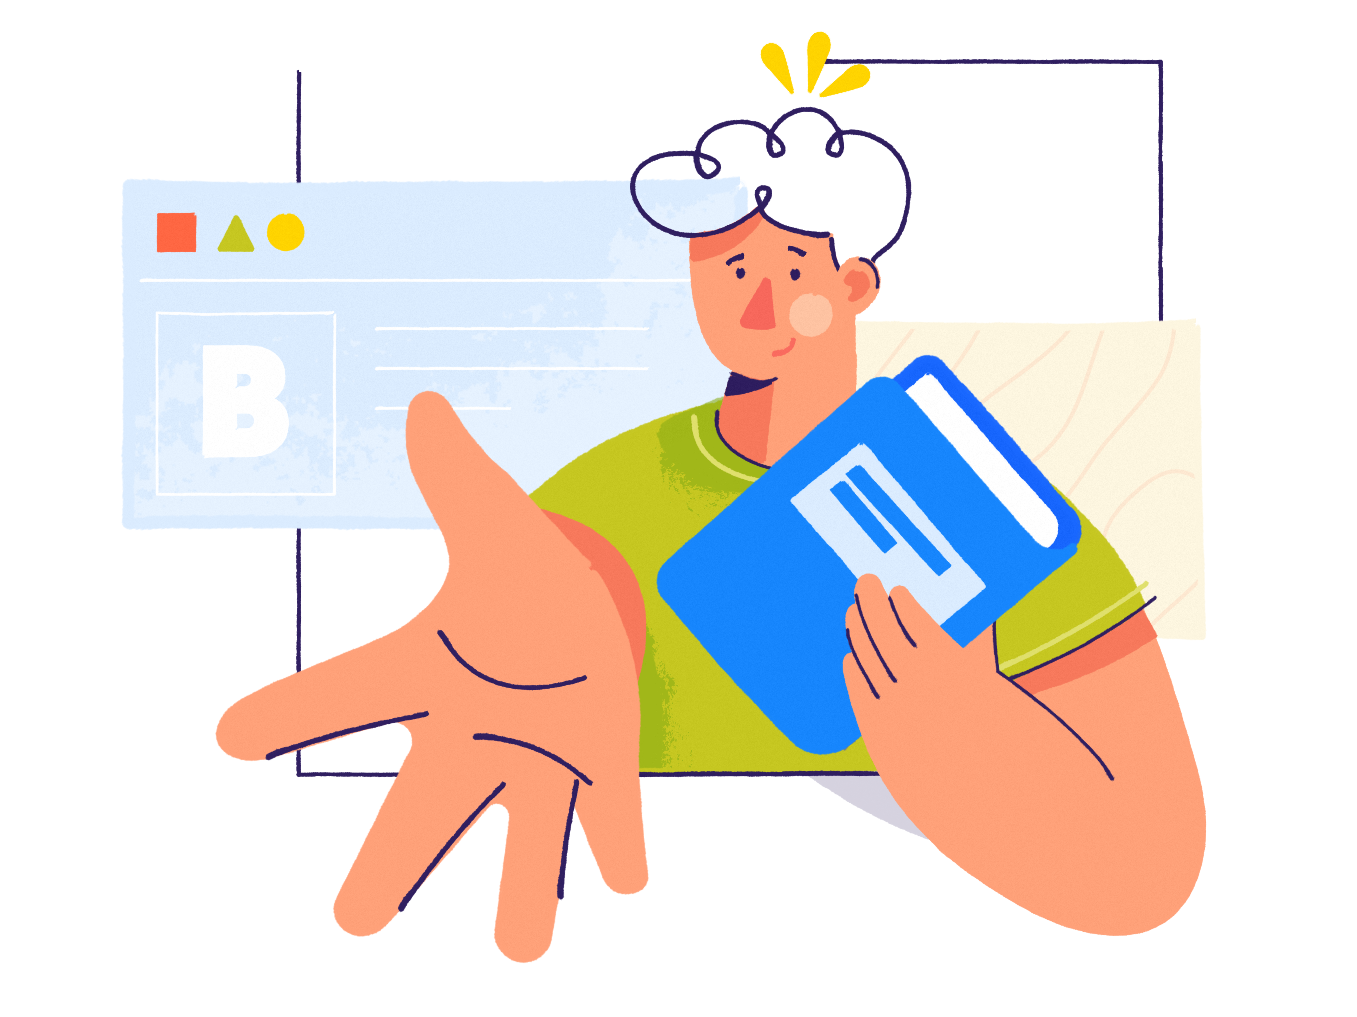 Tak a bet webpage pattern man affinity designer simple character illustration vector